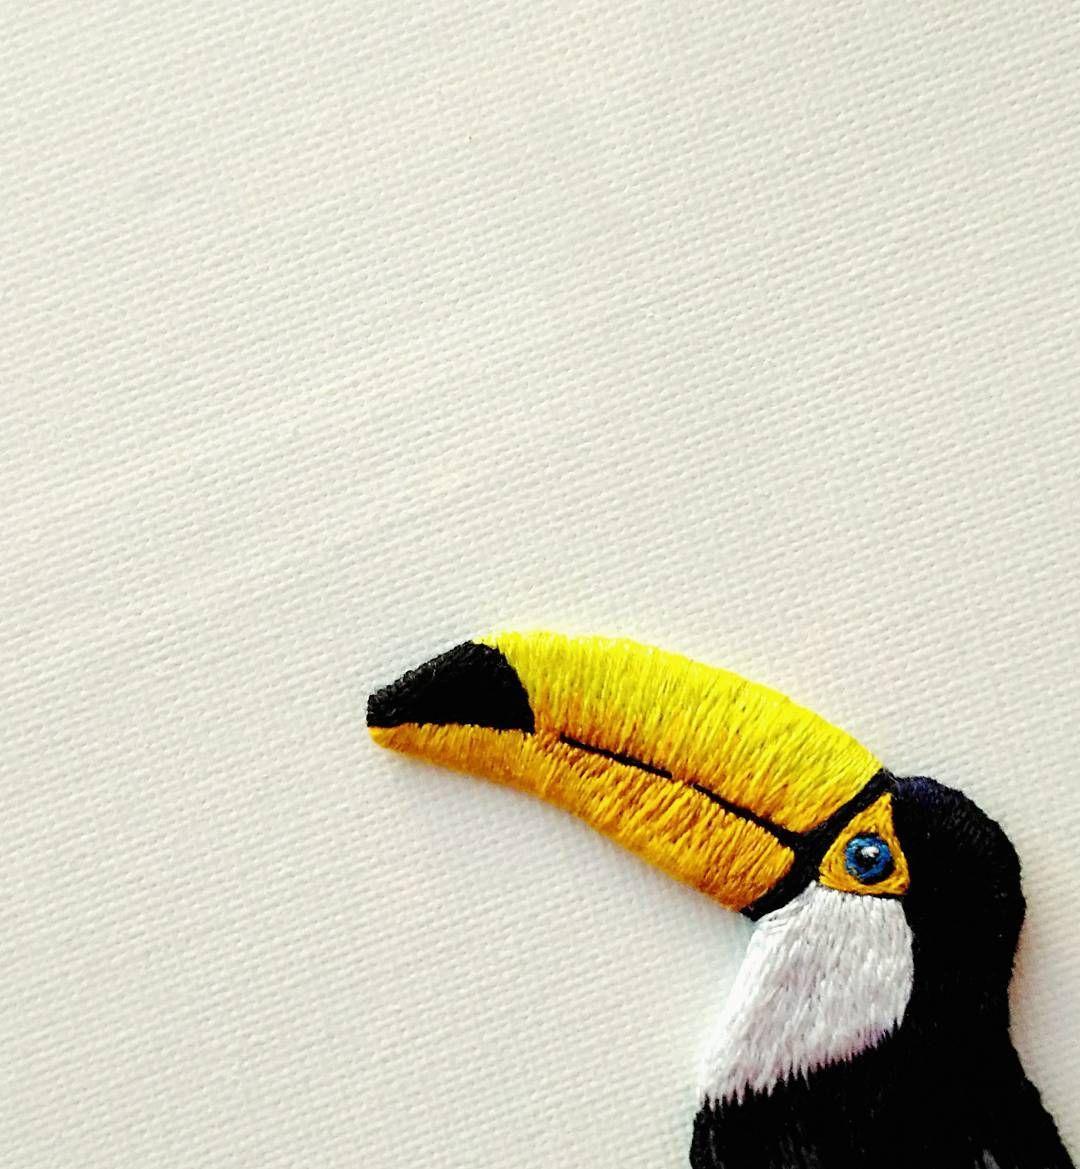 tucan embroidery brooch #Regram via @elena_polya_ | Stitchy things ...